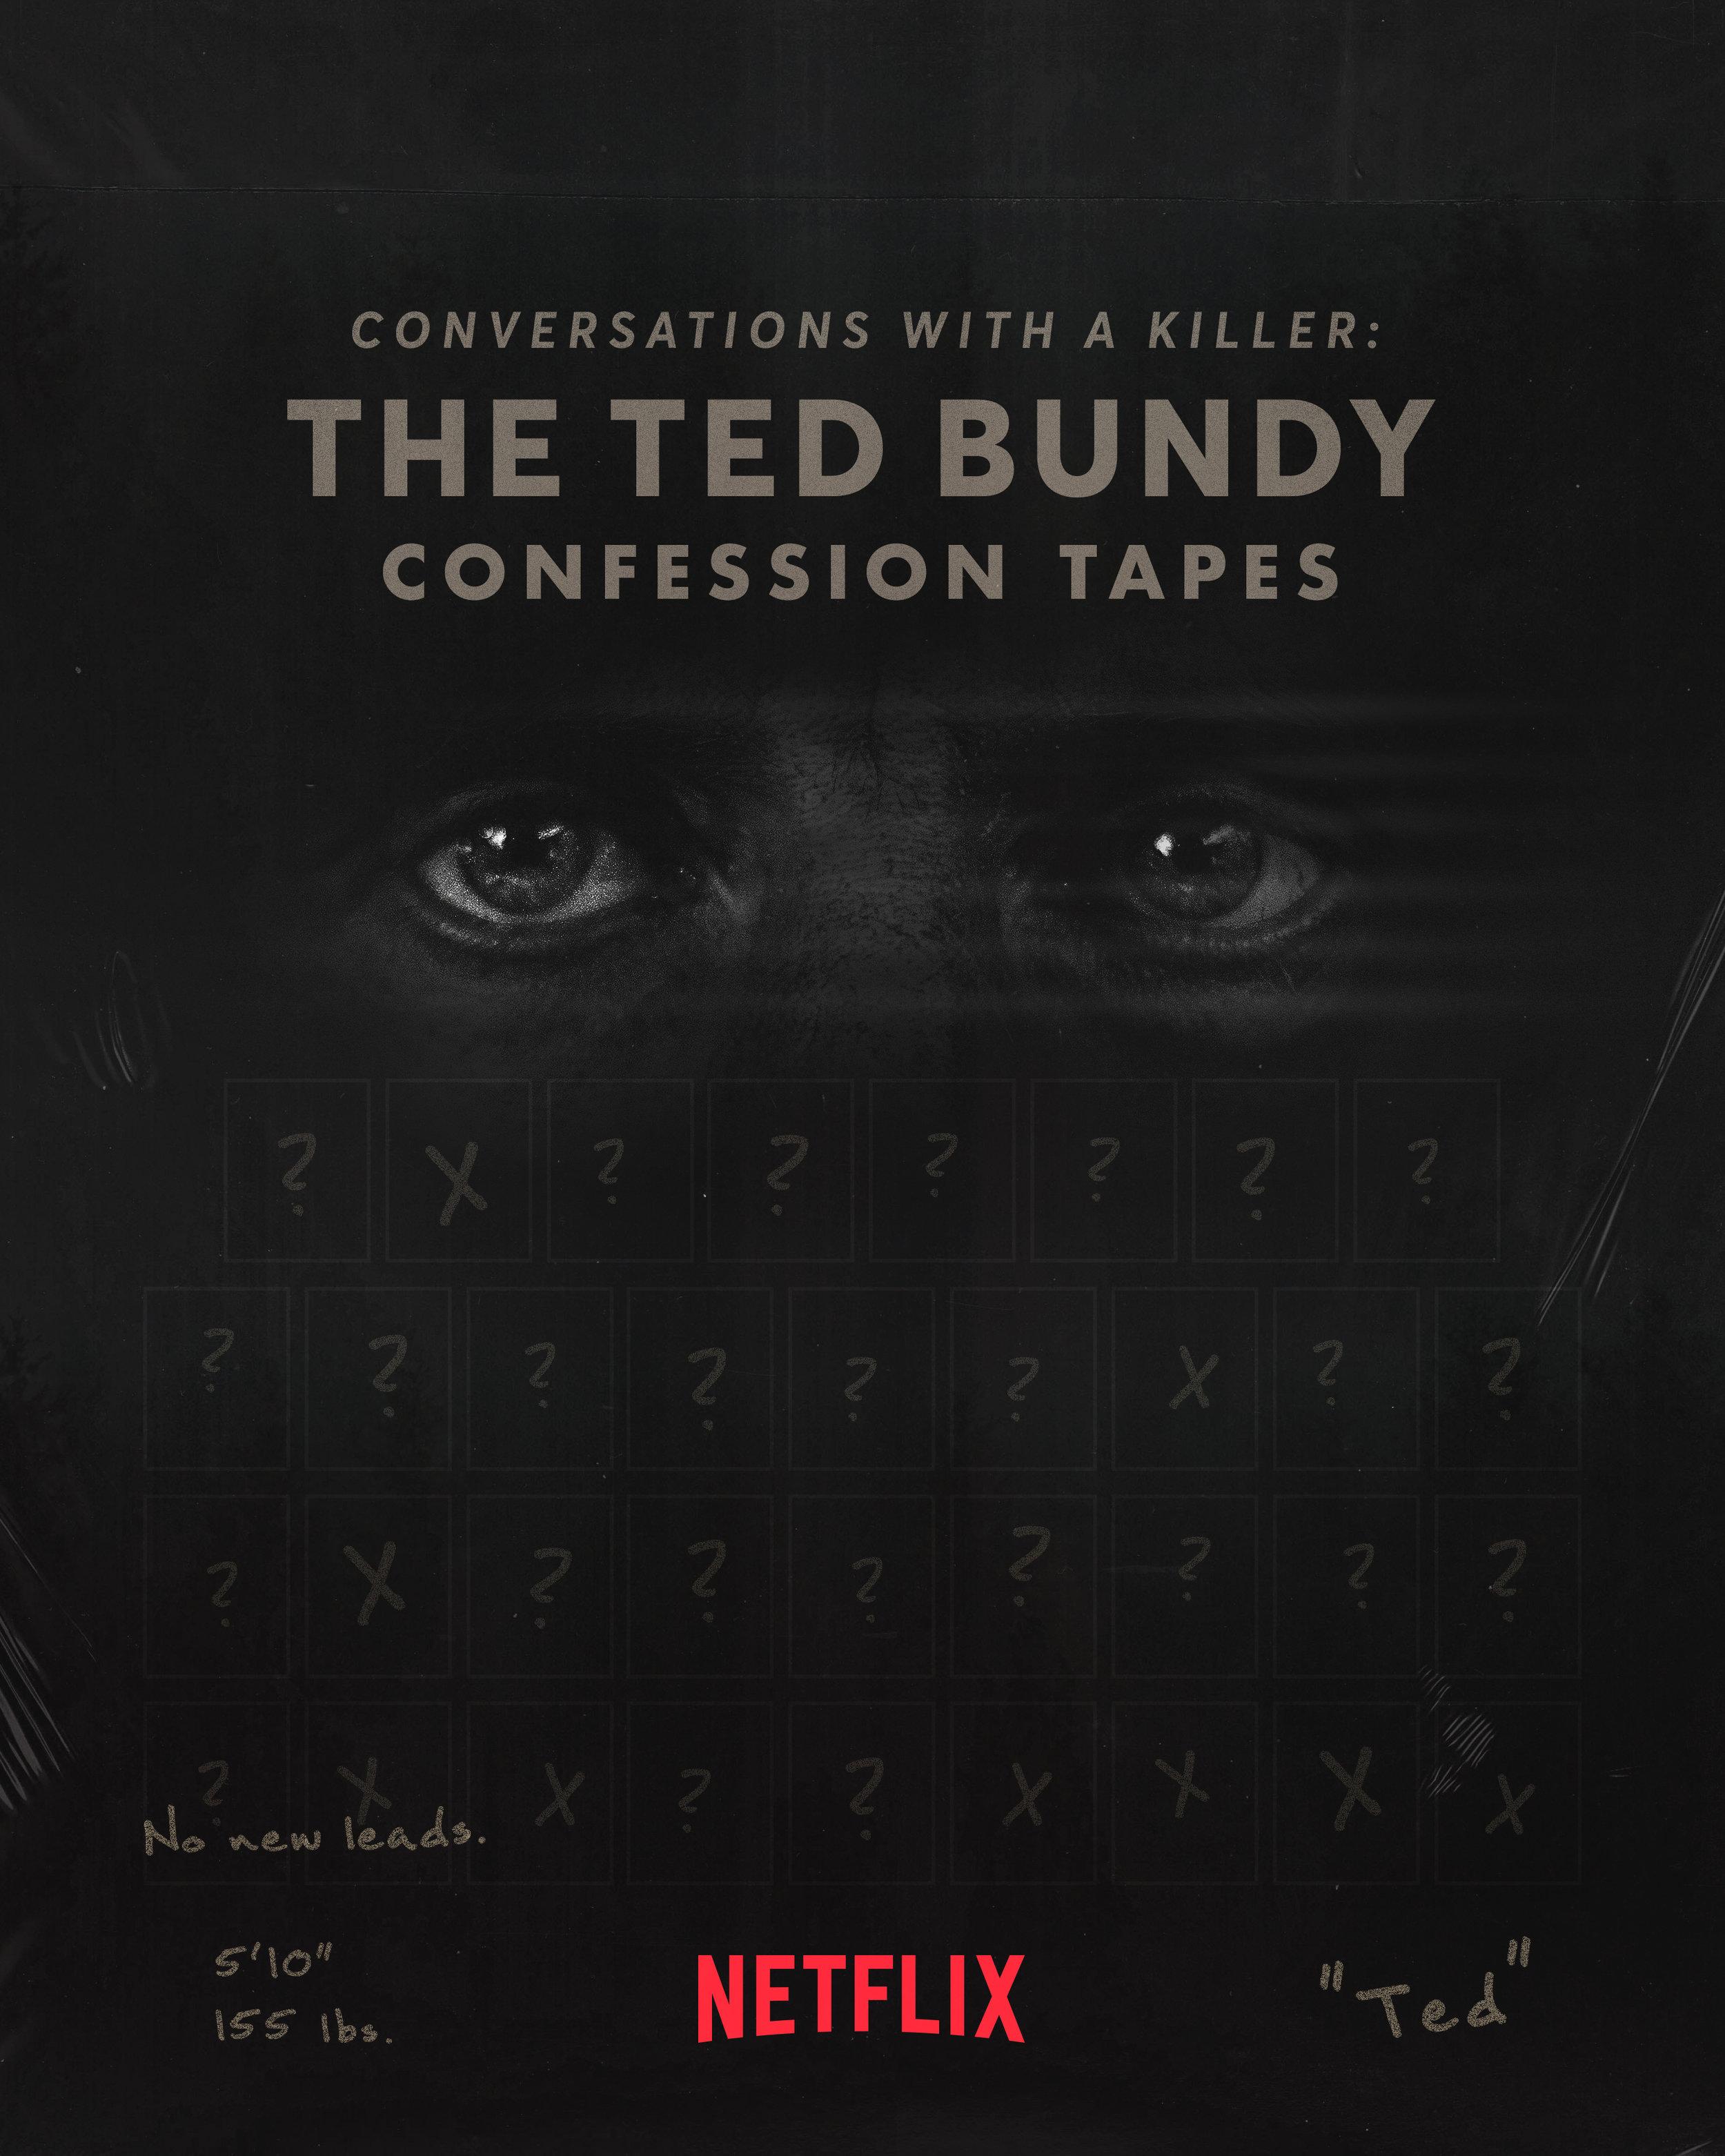 tedBundyConfessionTapes.jpg